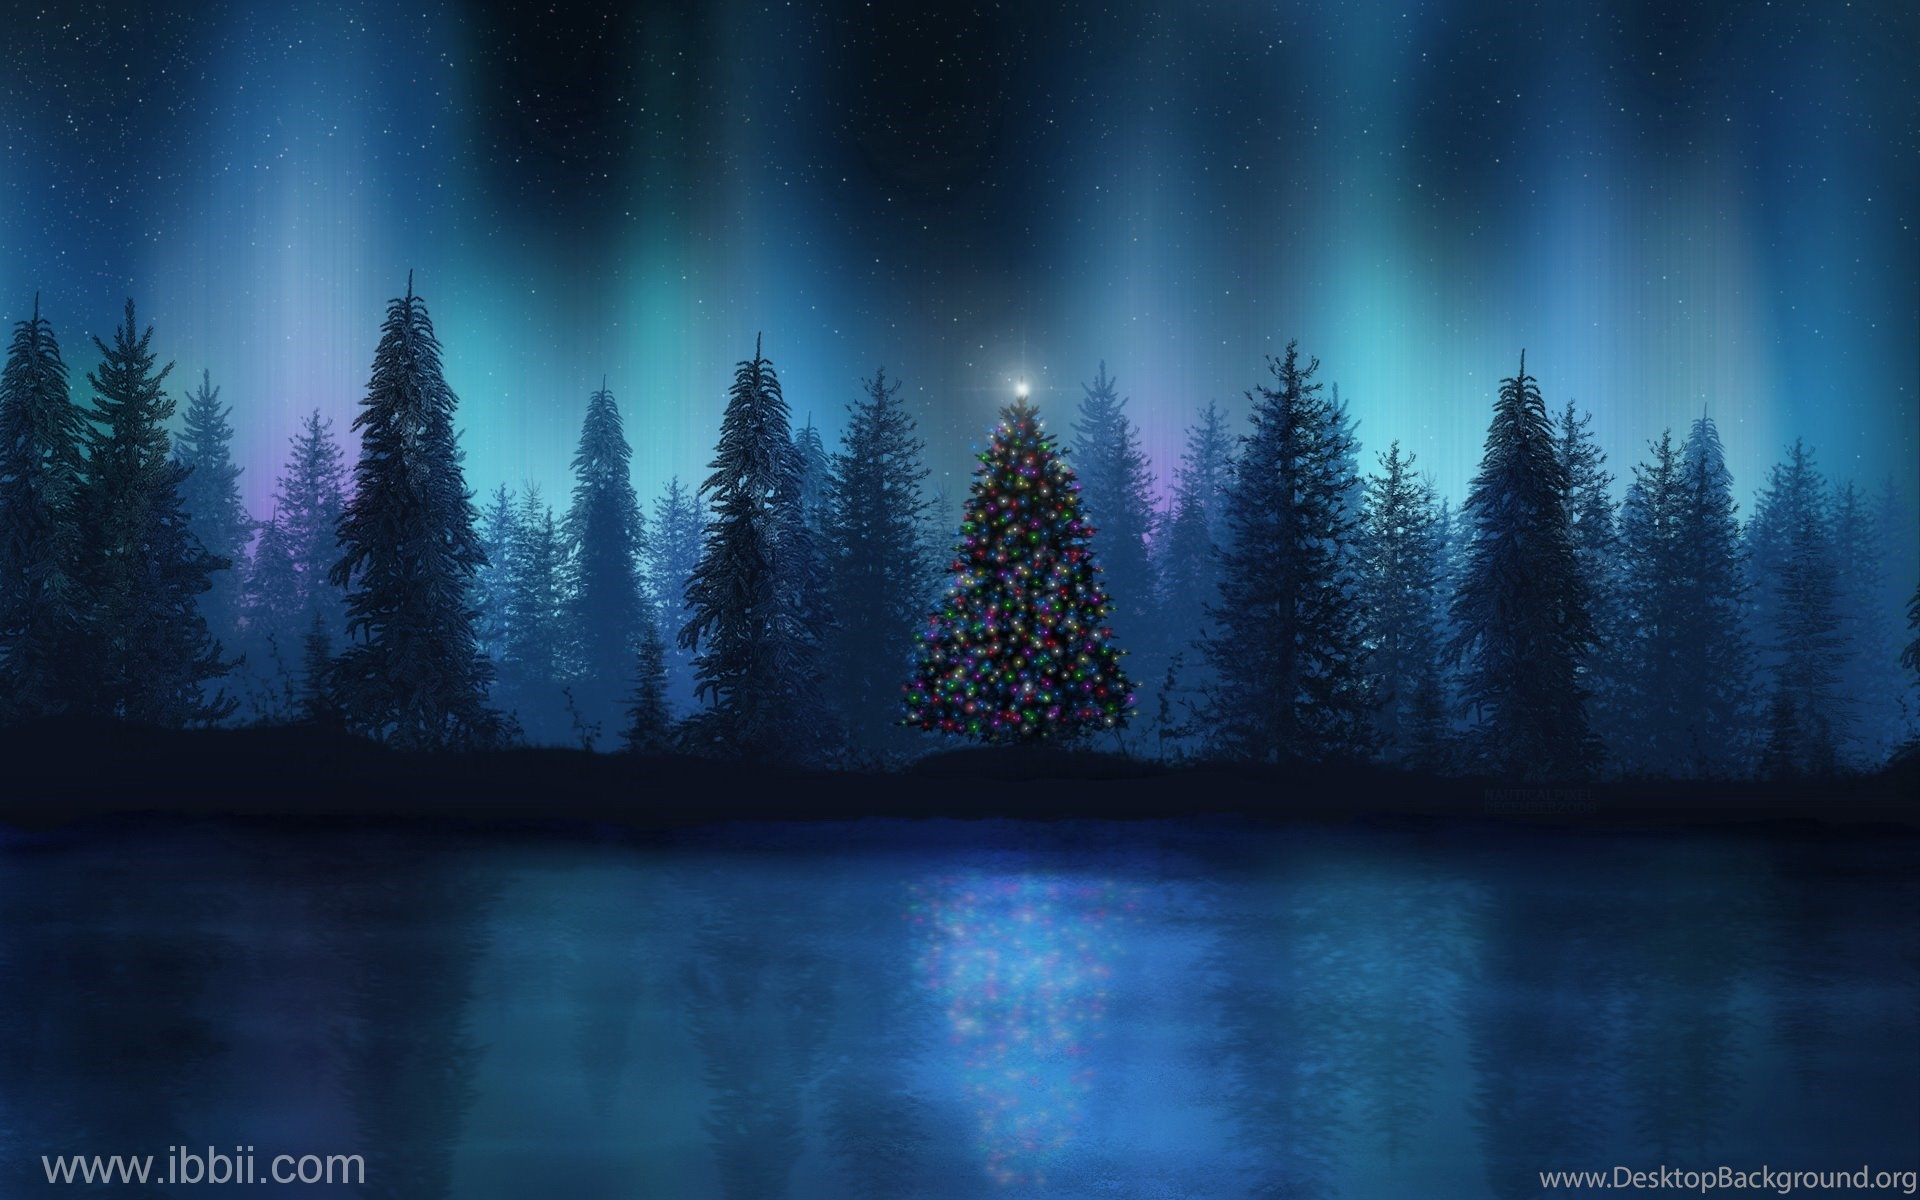 Beautiful Nature Winter Wallpapers High Resolution Desktop Background